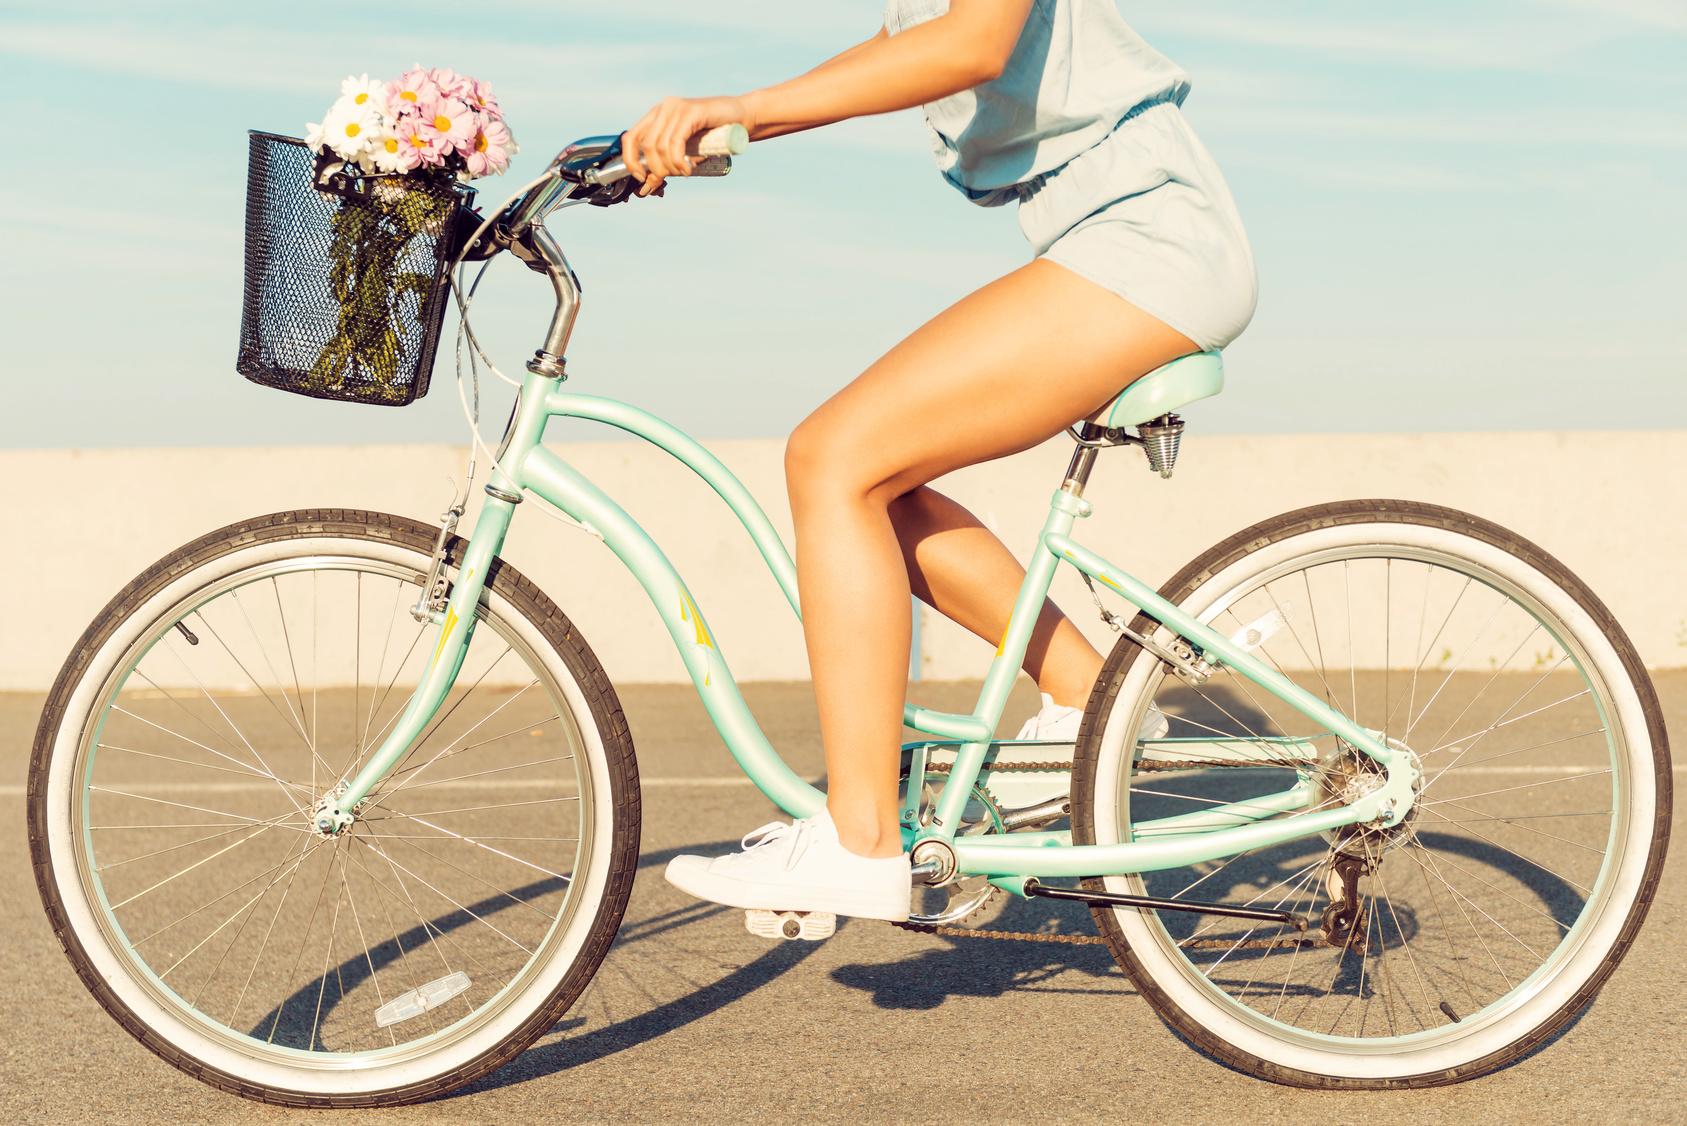 Fit durchs Fahrrad fahren